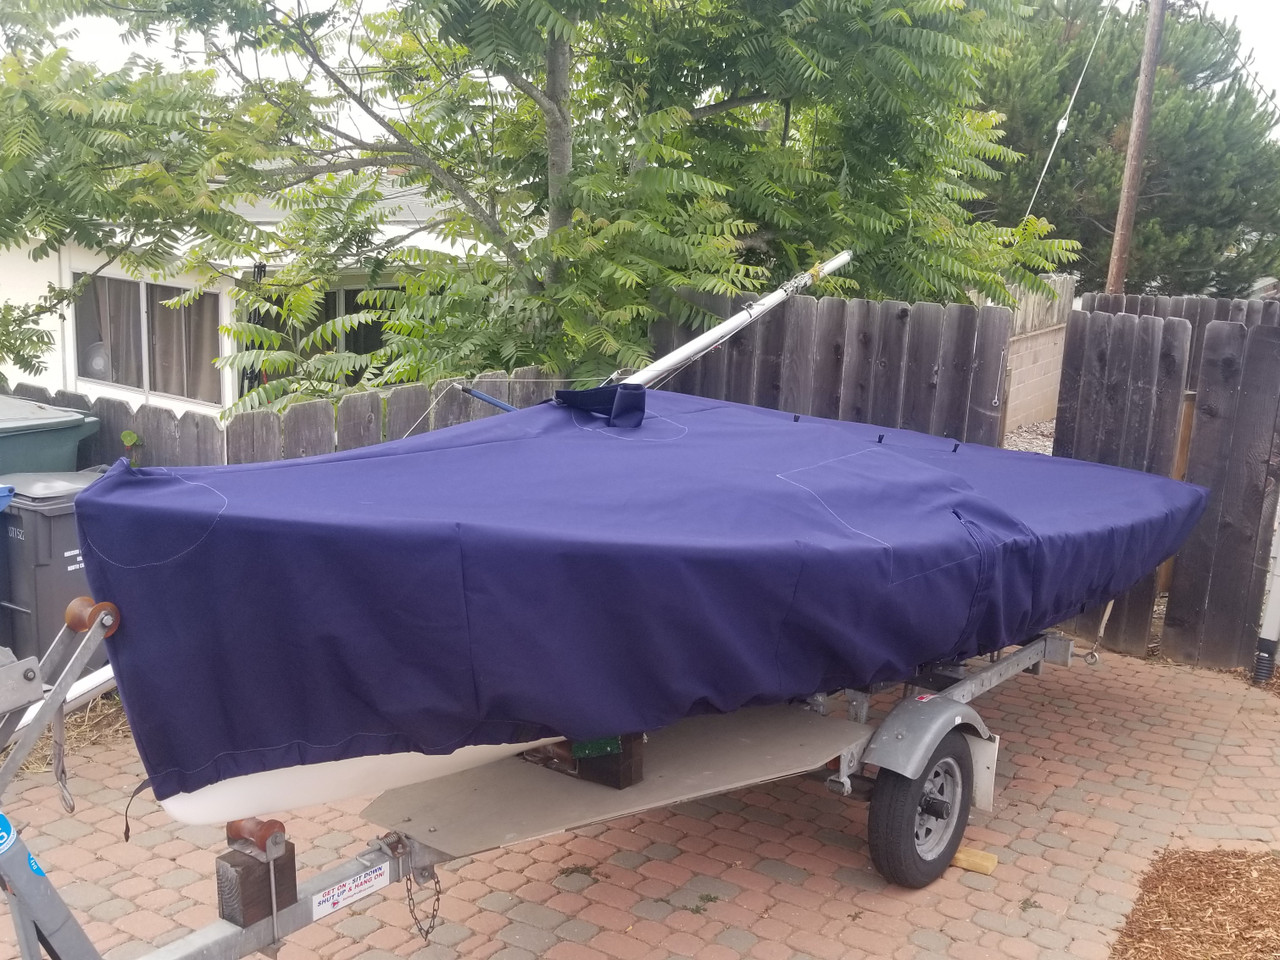 O'Day Daysailer Mast Up Flat - Skirted Mooring Cover by SLO Sail and Canvas